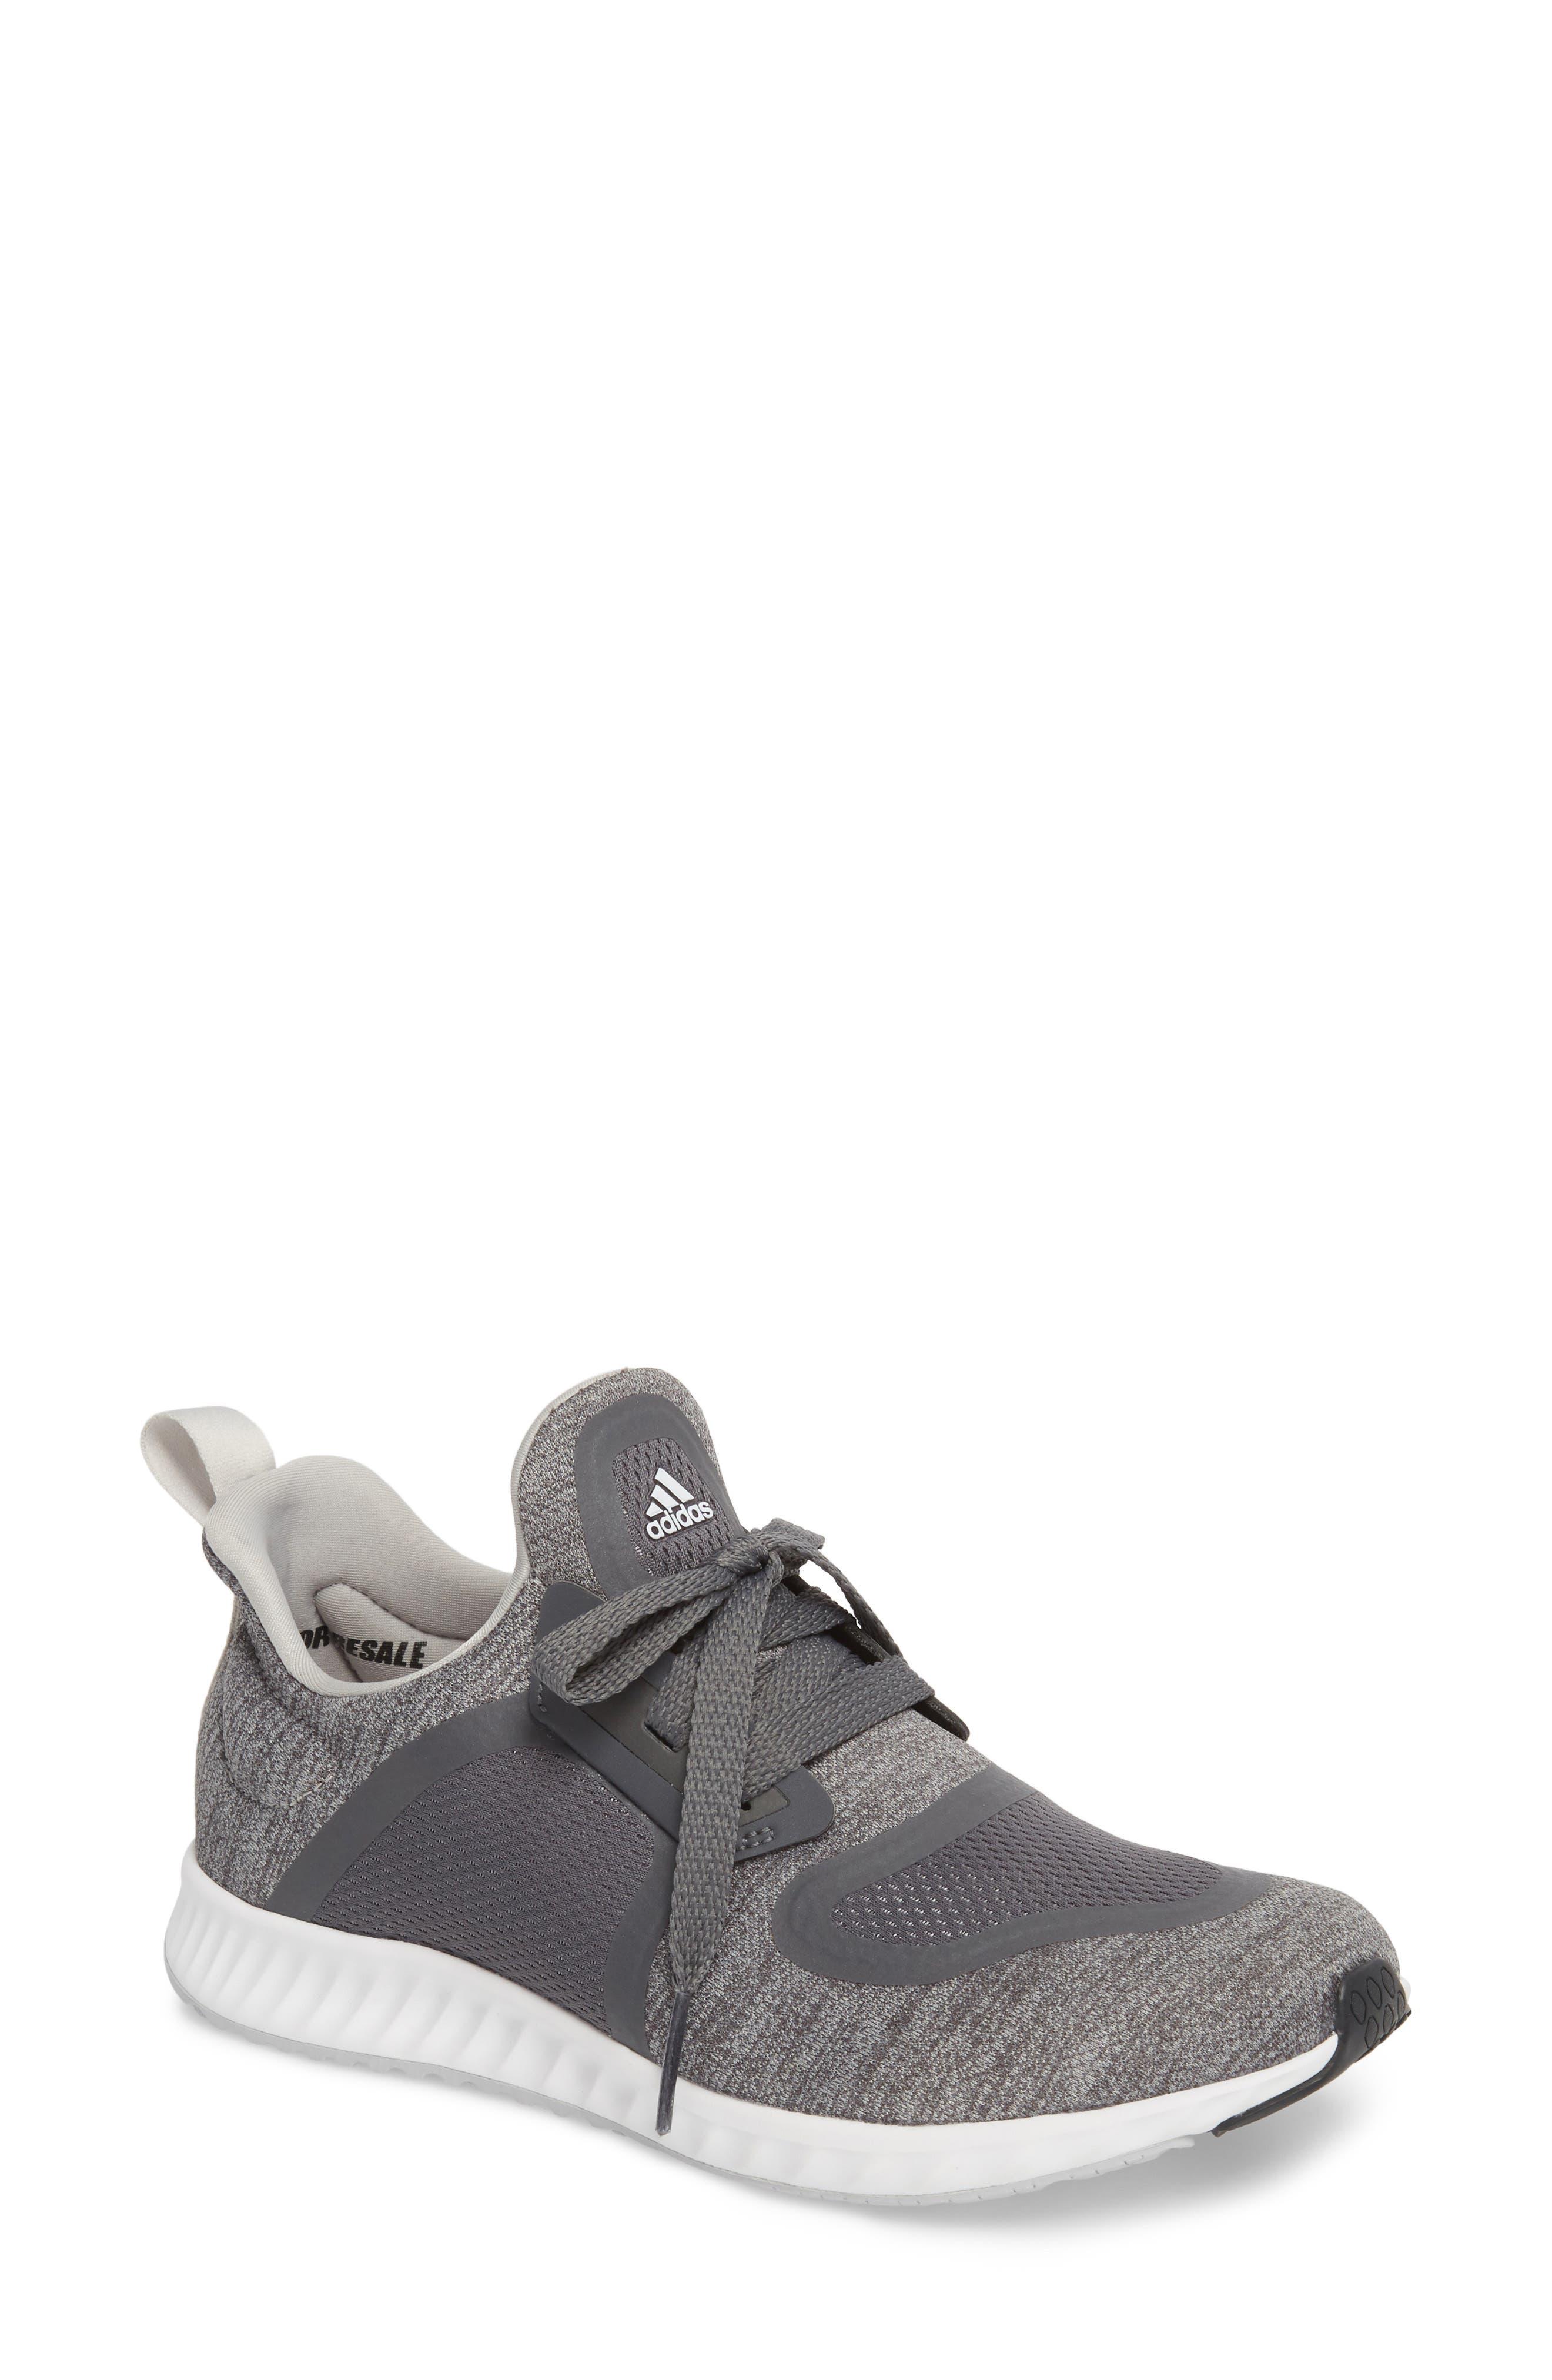 ADIDAS, Edge Lux Clima Running Shoe, Main thumbnail 1, color, 033